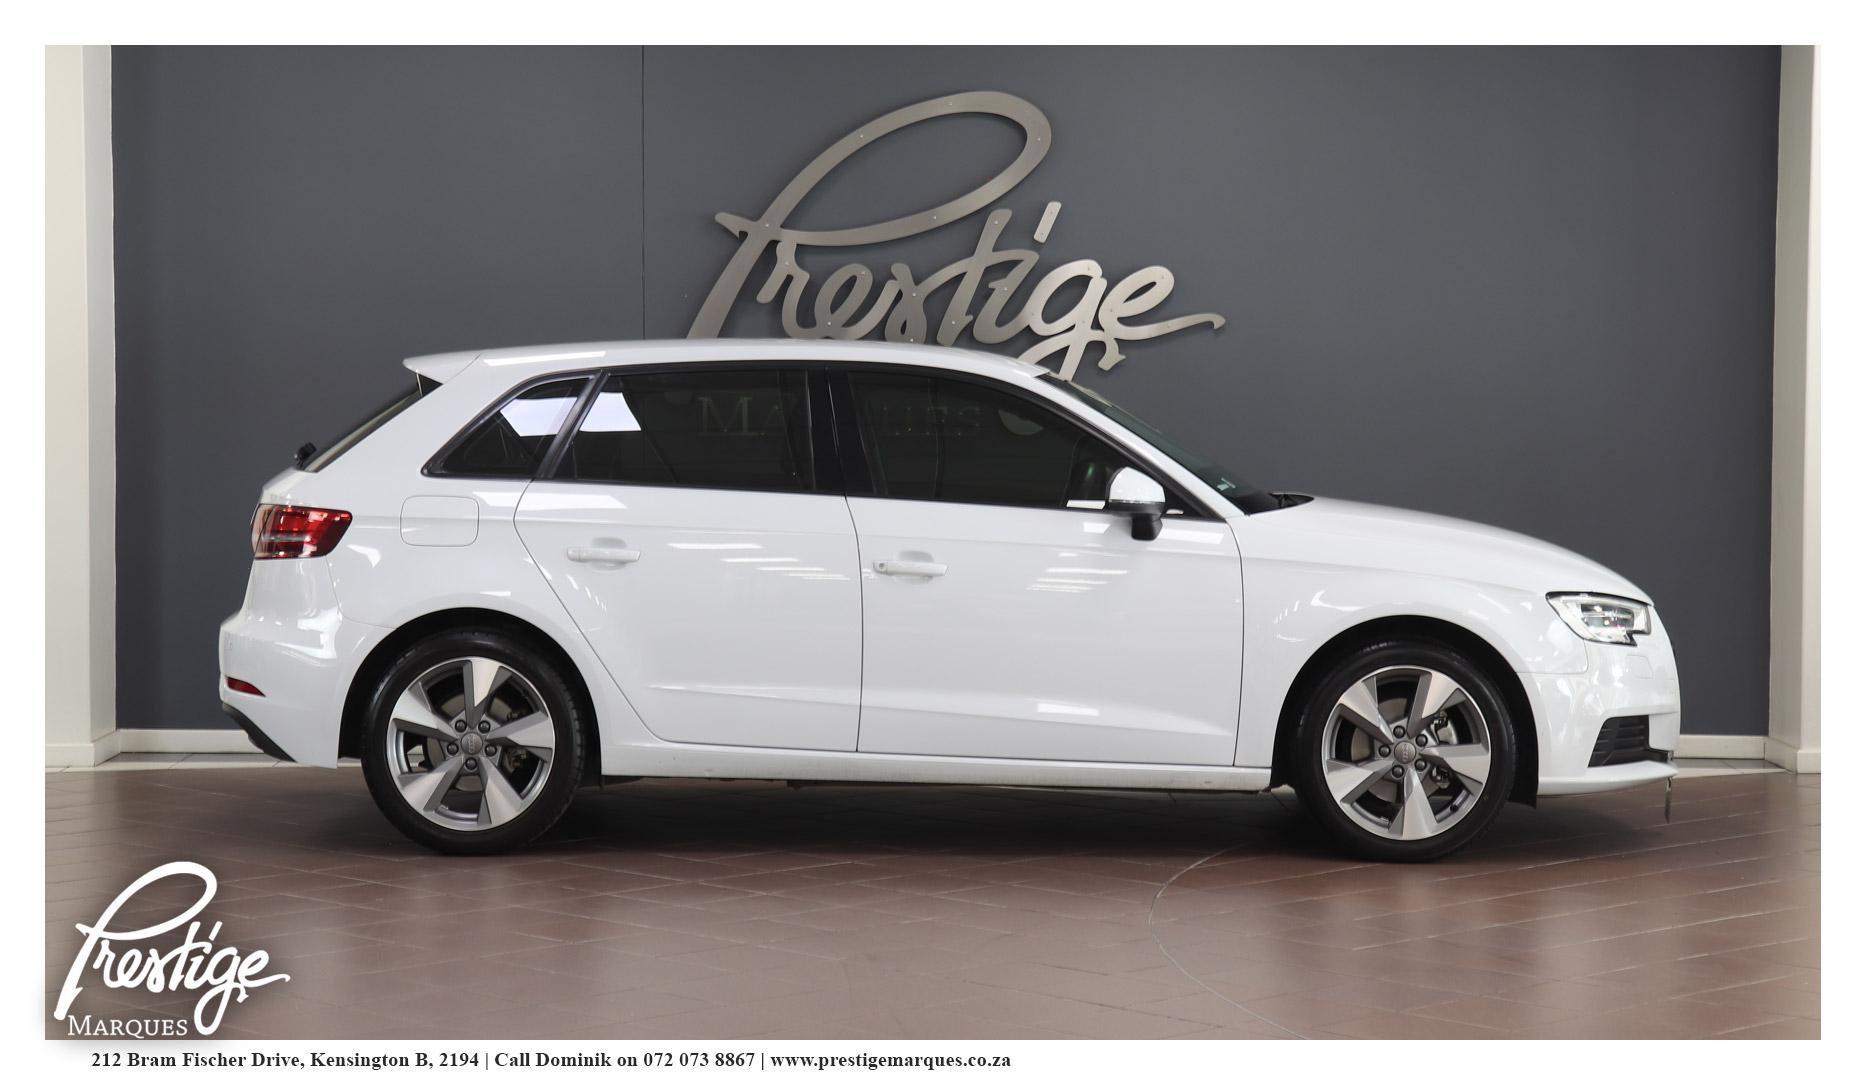 2017-Audi-A3-Sportback-1-4-TFSi-Stronic-Prestige-Marques-Randburg-Sandton-3